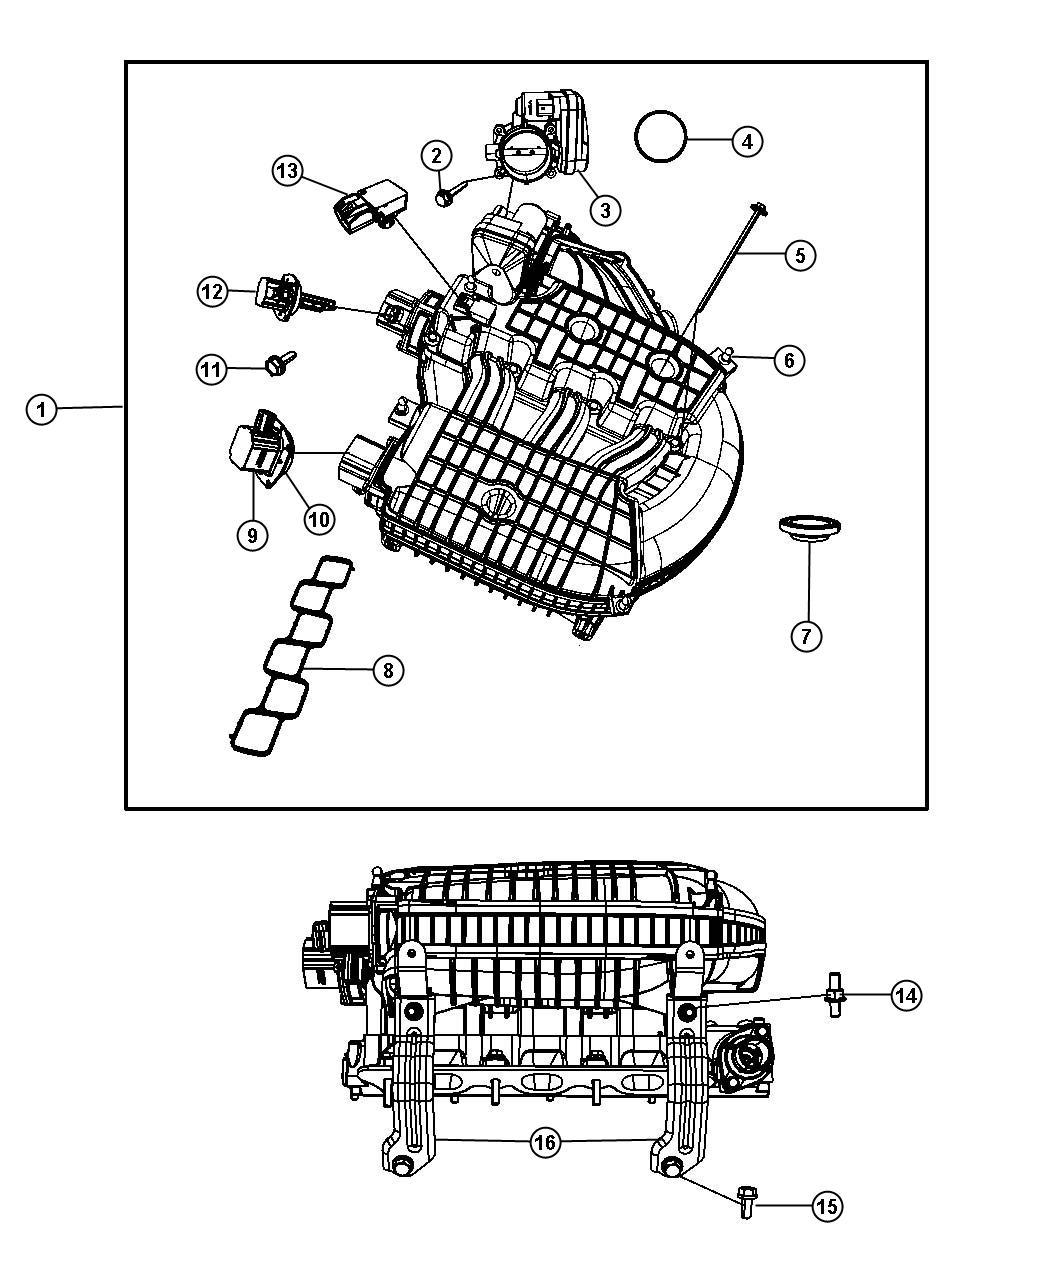 Dodge NITRO Plenum. Intake manifold. Engine, upper, sohc